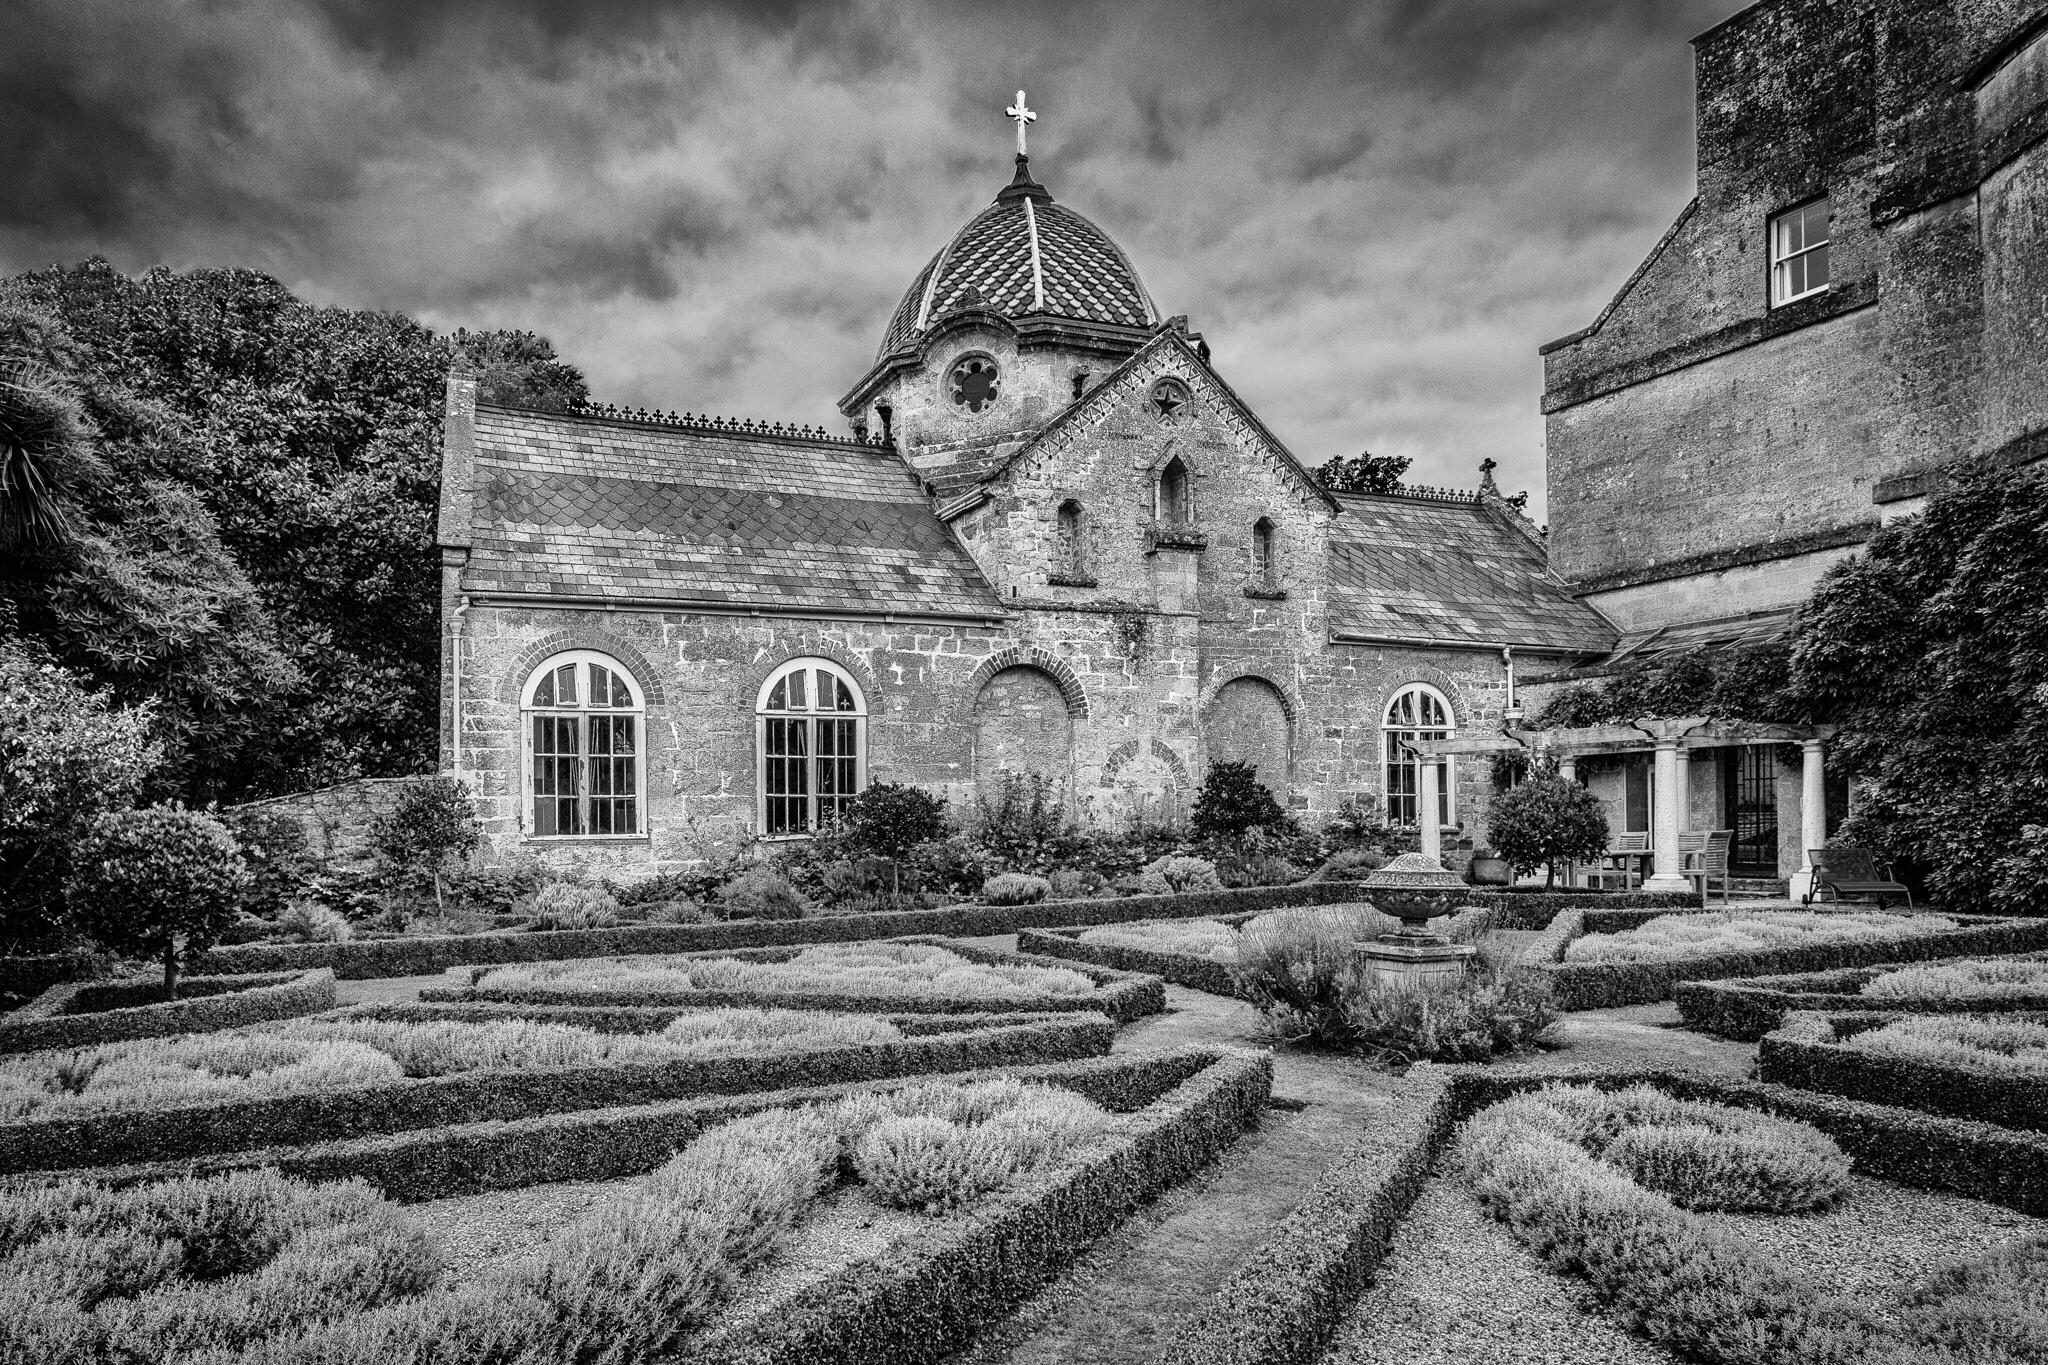 Chideock Church - the original edit